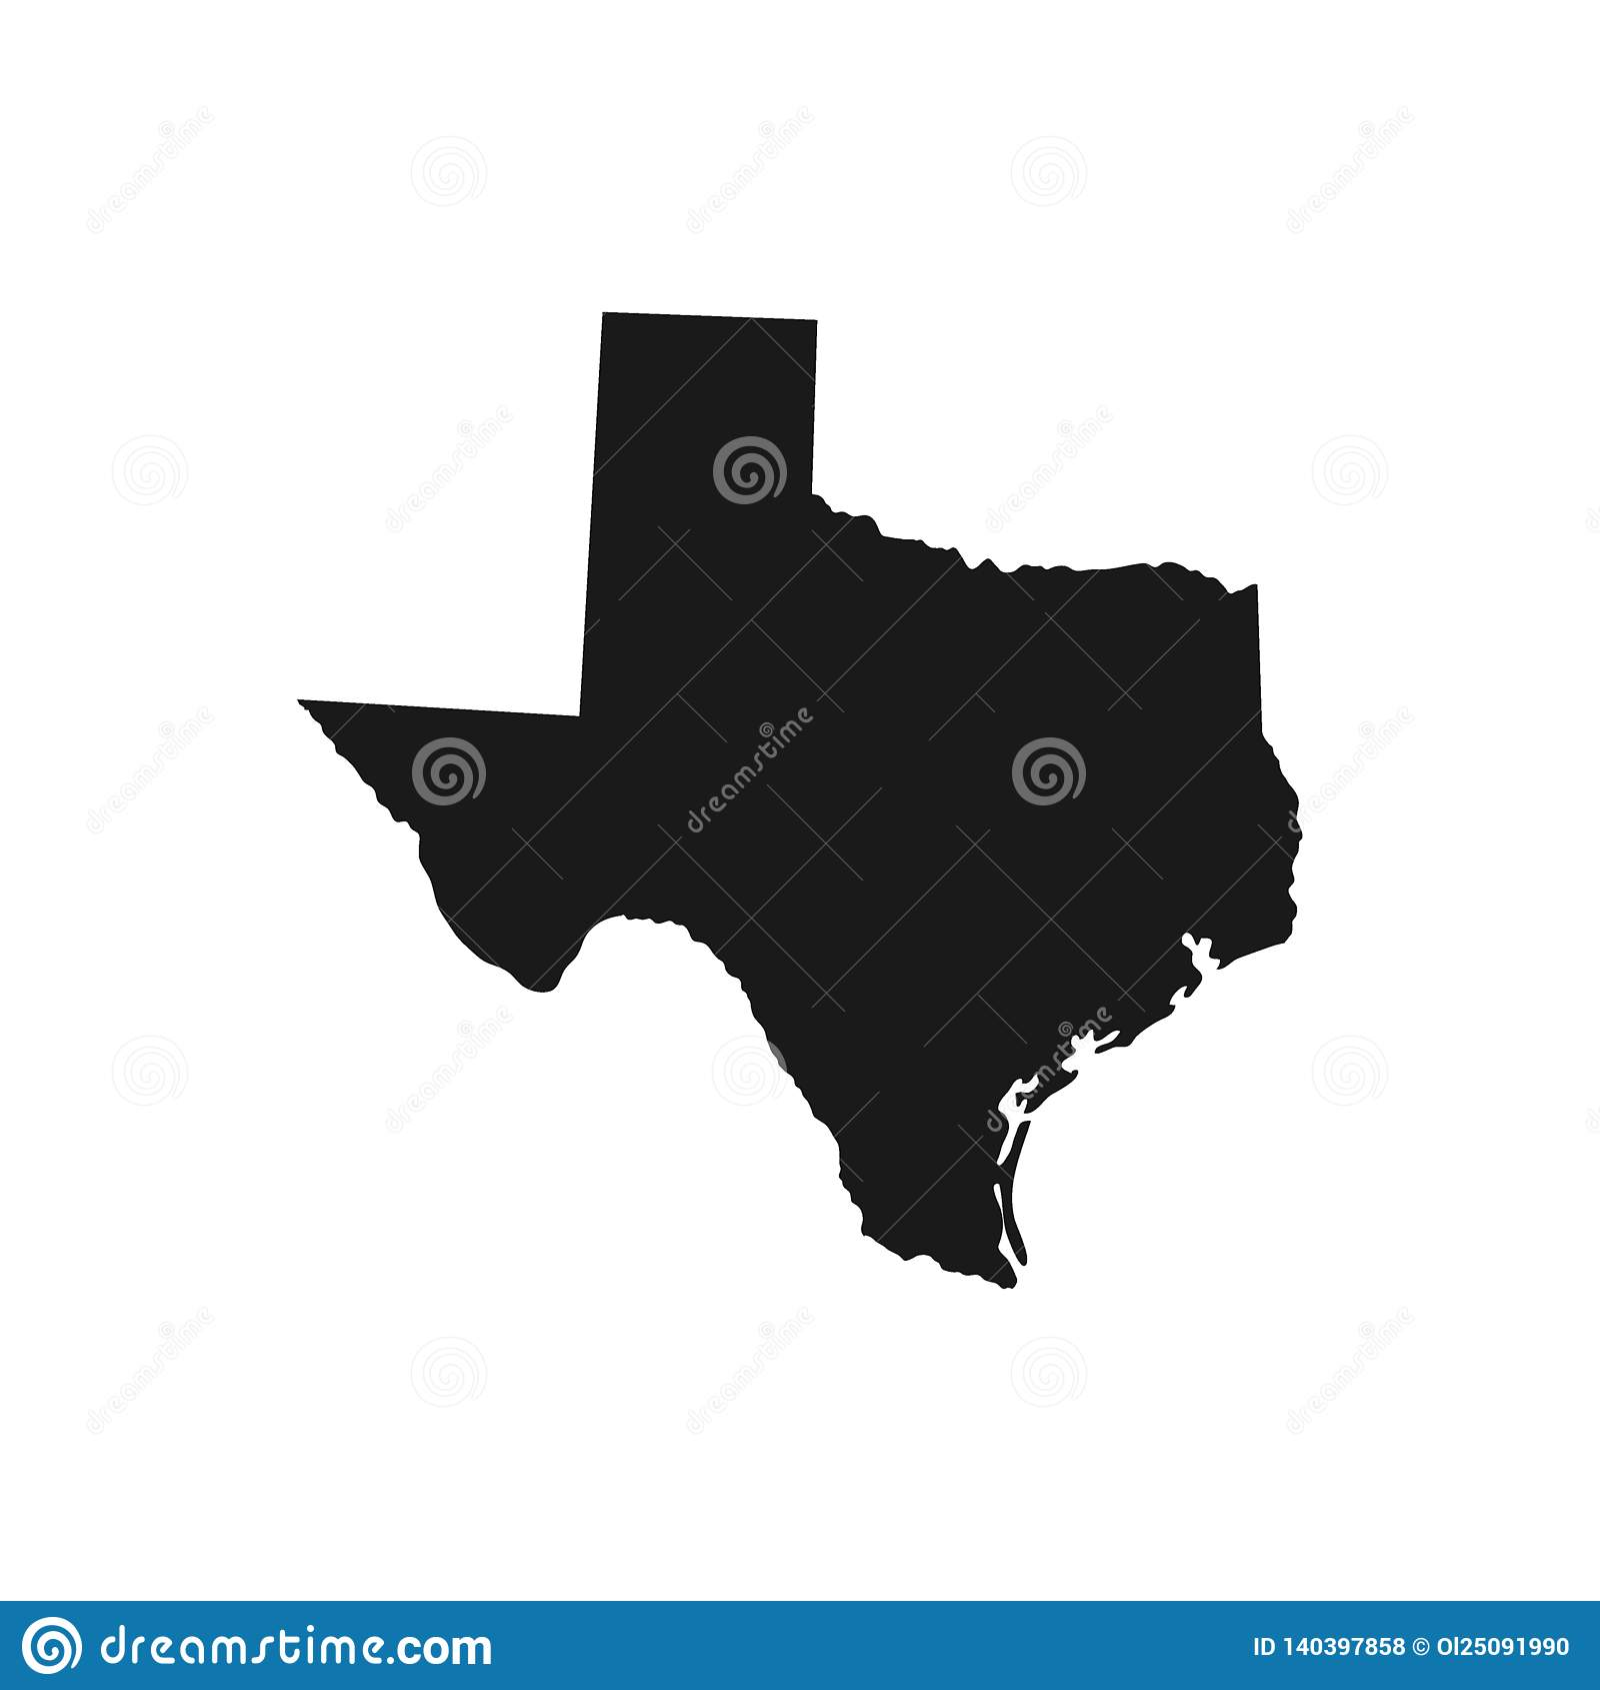 Teksas, stan usa - stała czarna sylwetki mapa kraju teren